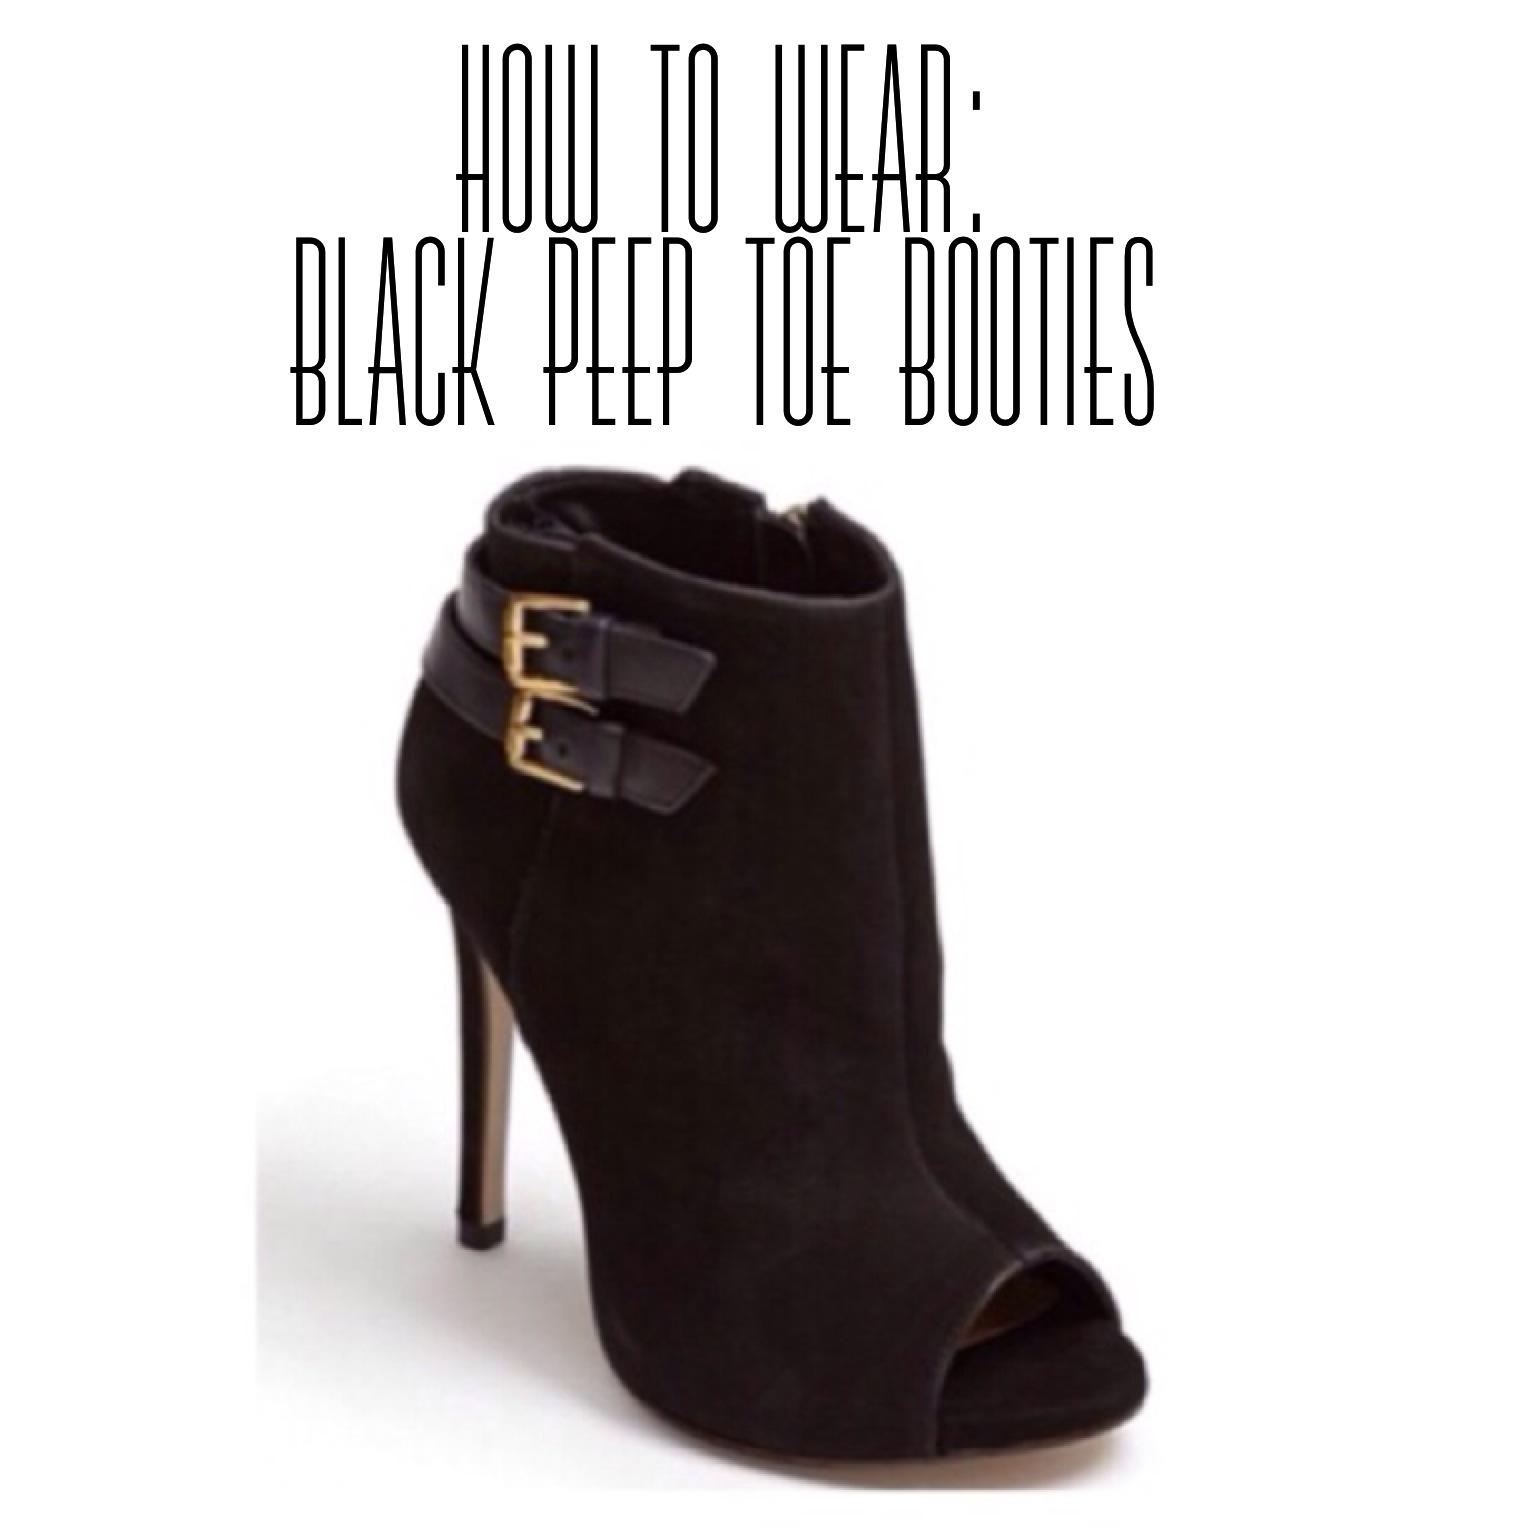 How To Wear: Black High Heel Peep Toe Booties